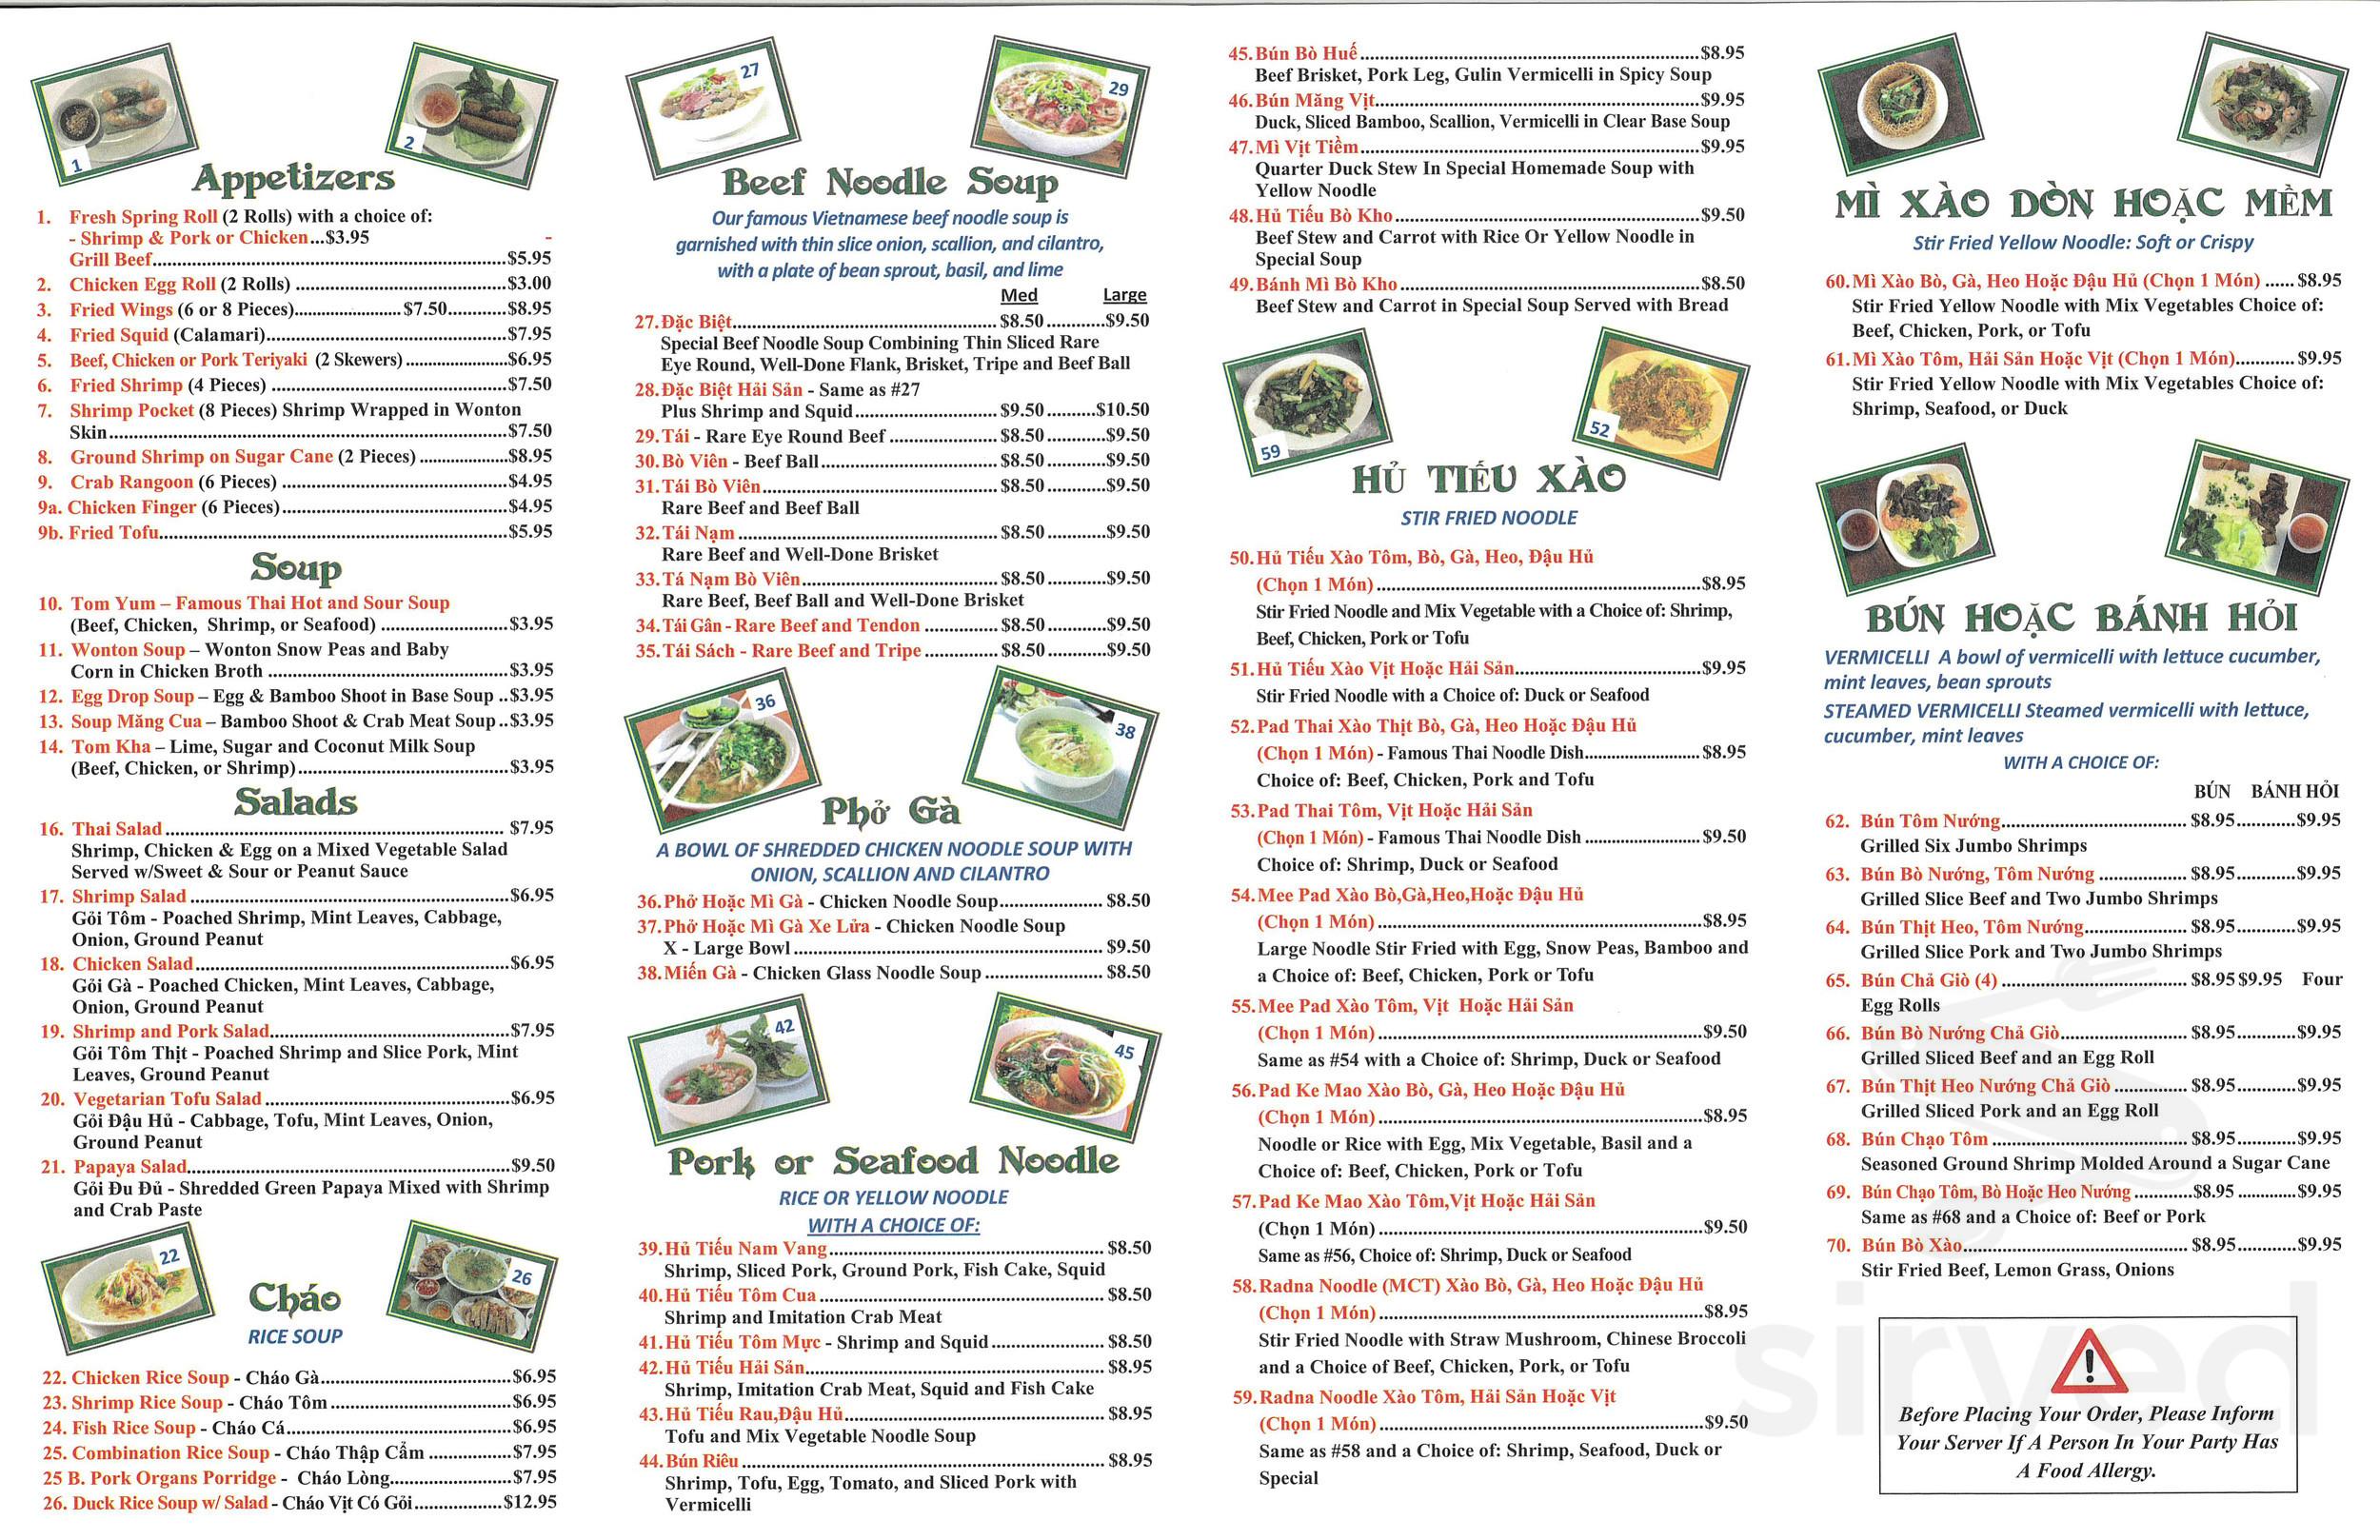 Viet Thai Restaurant Menu In Lowell Massachusetts Usa